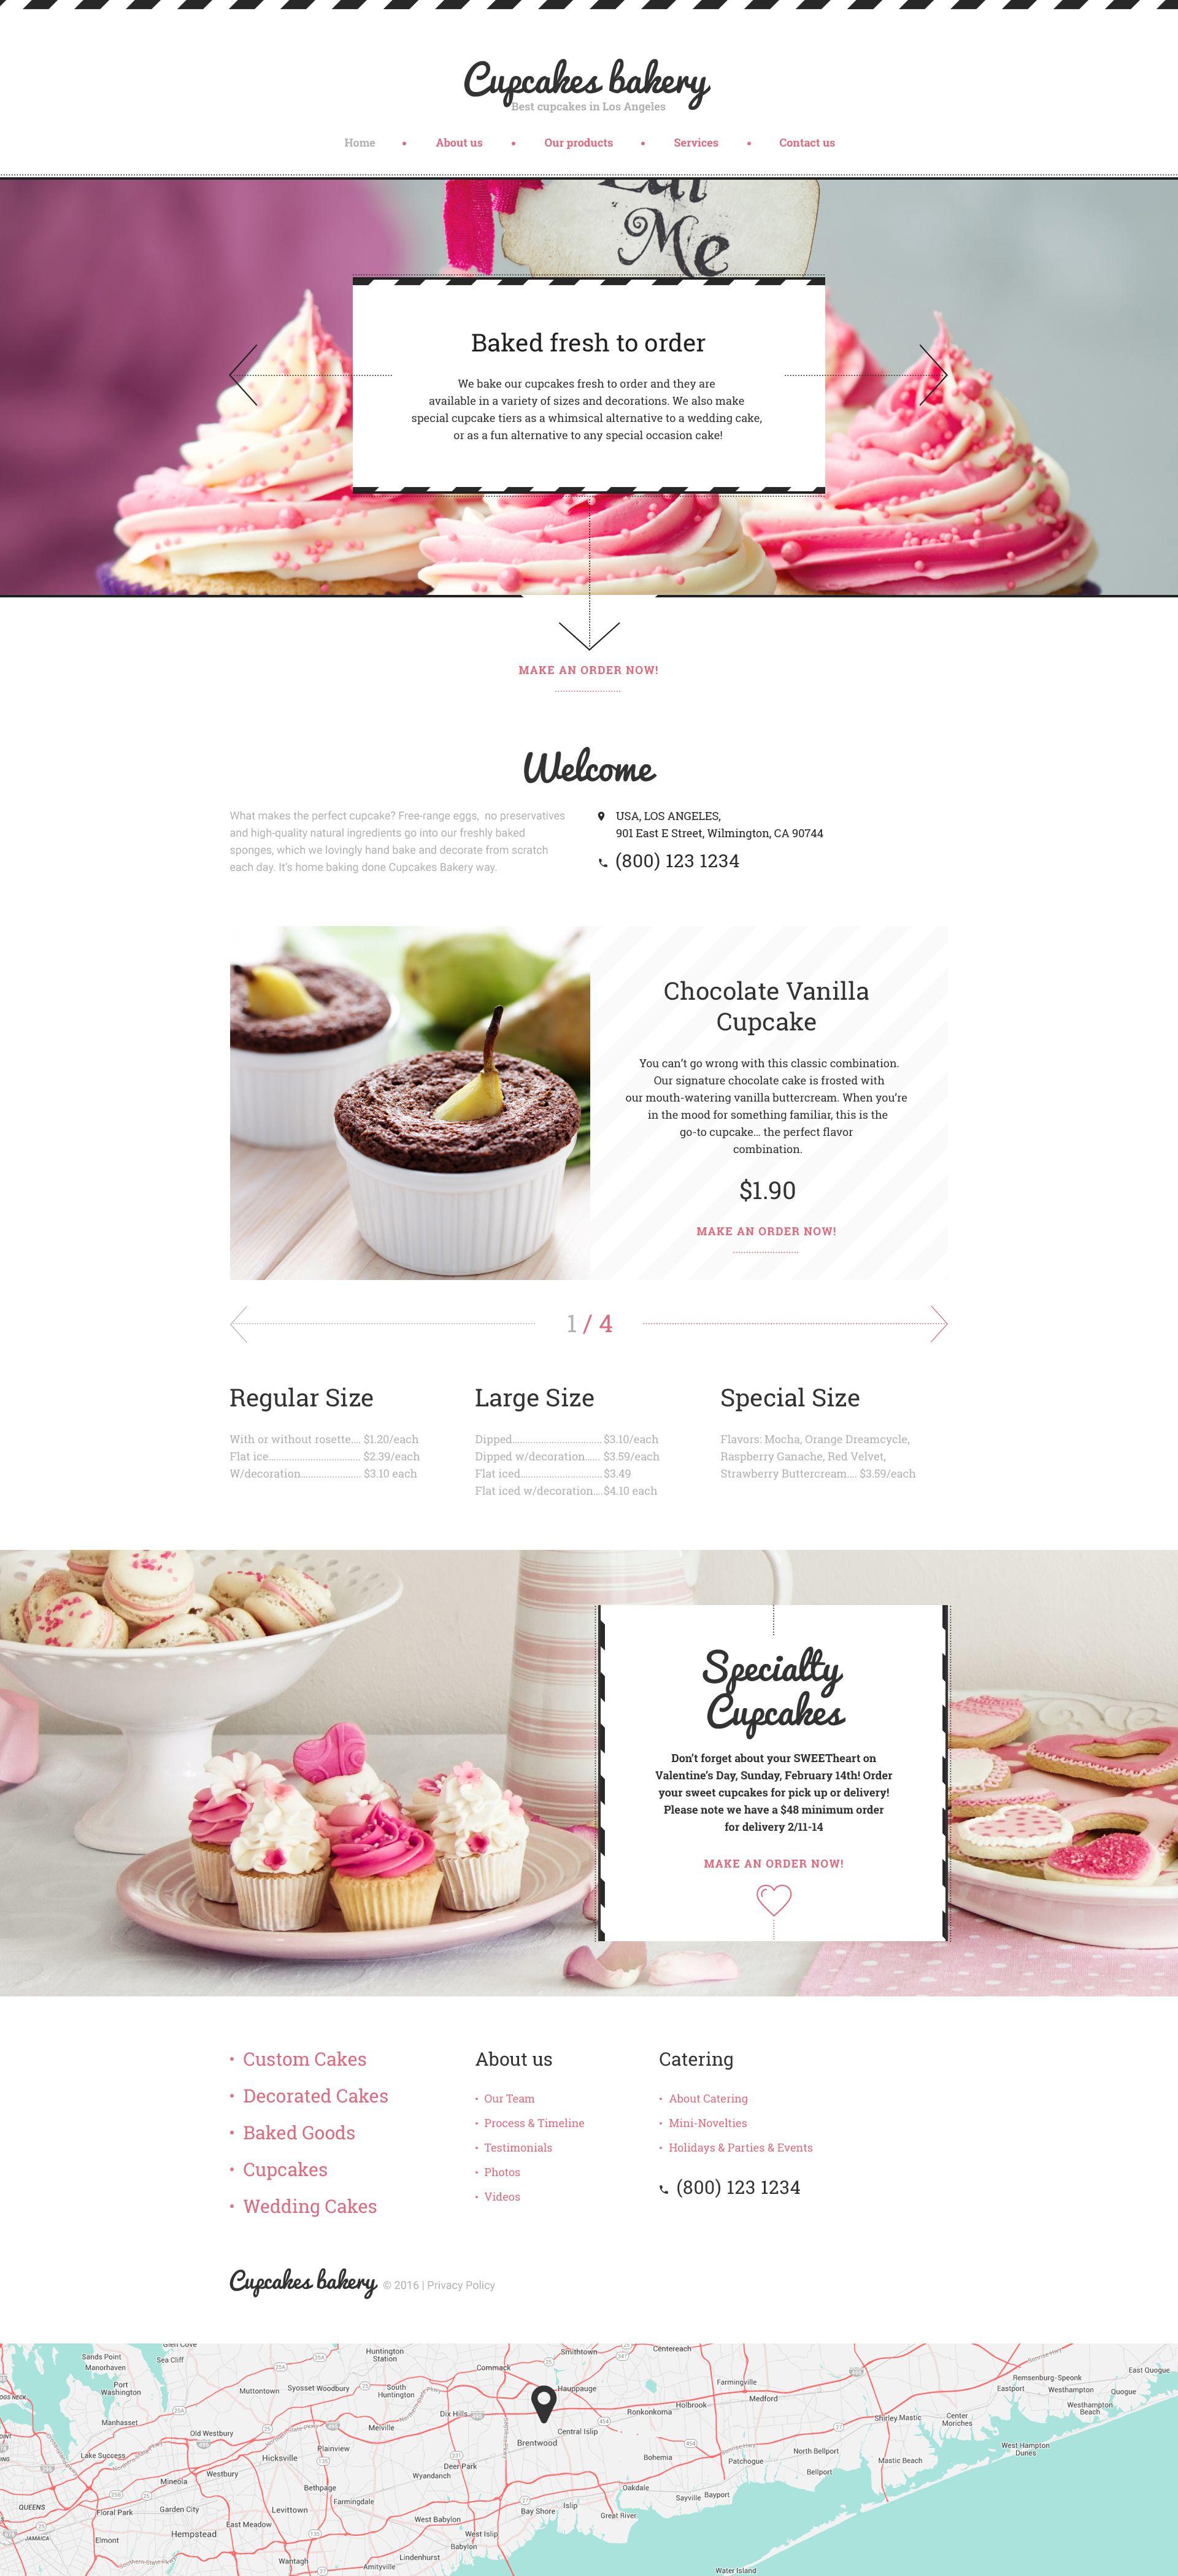 Cupcakes Bakery Website Template New Website Templates Bakery